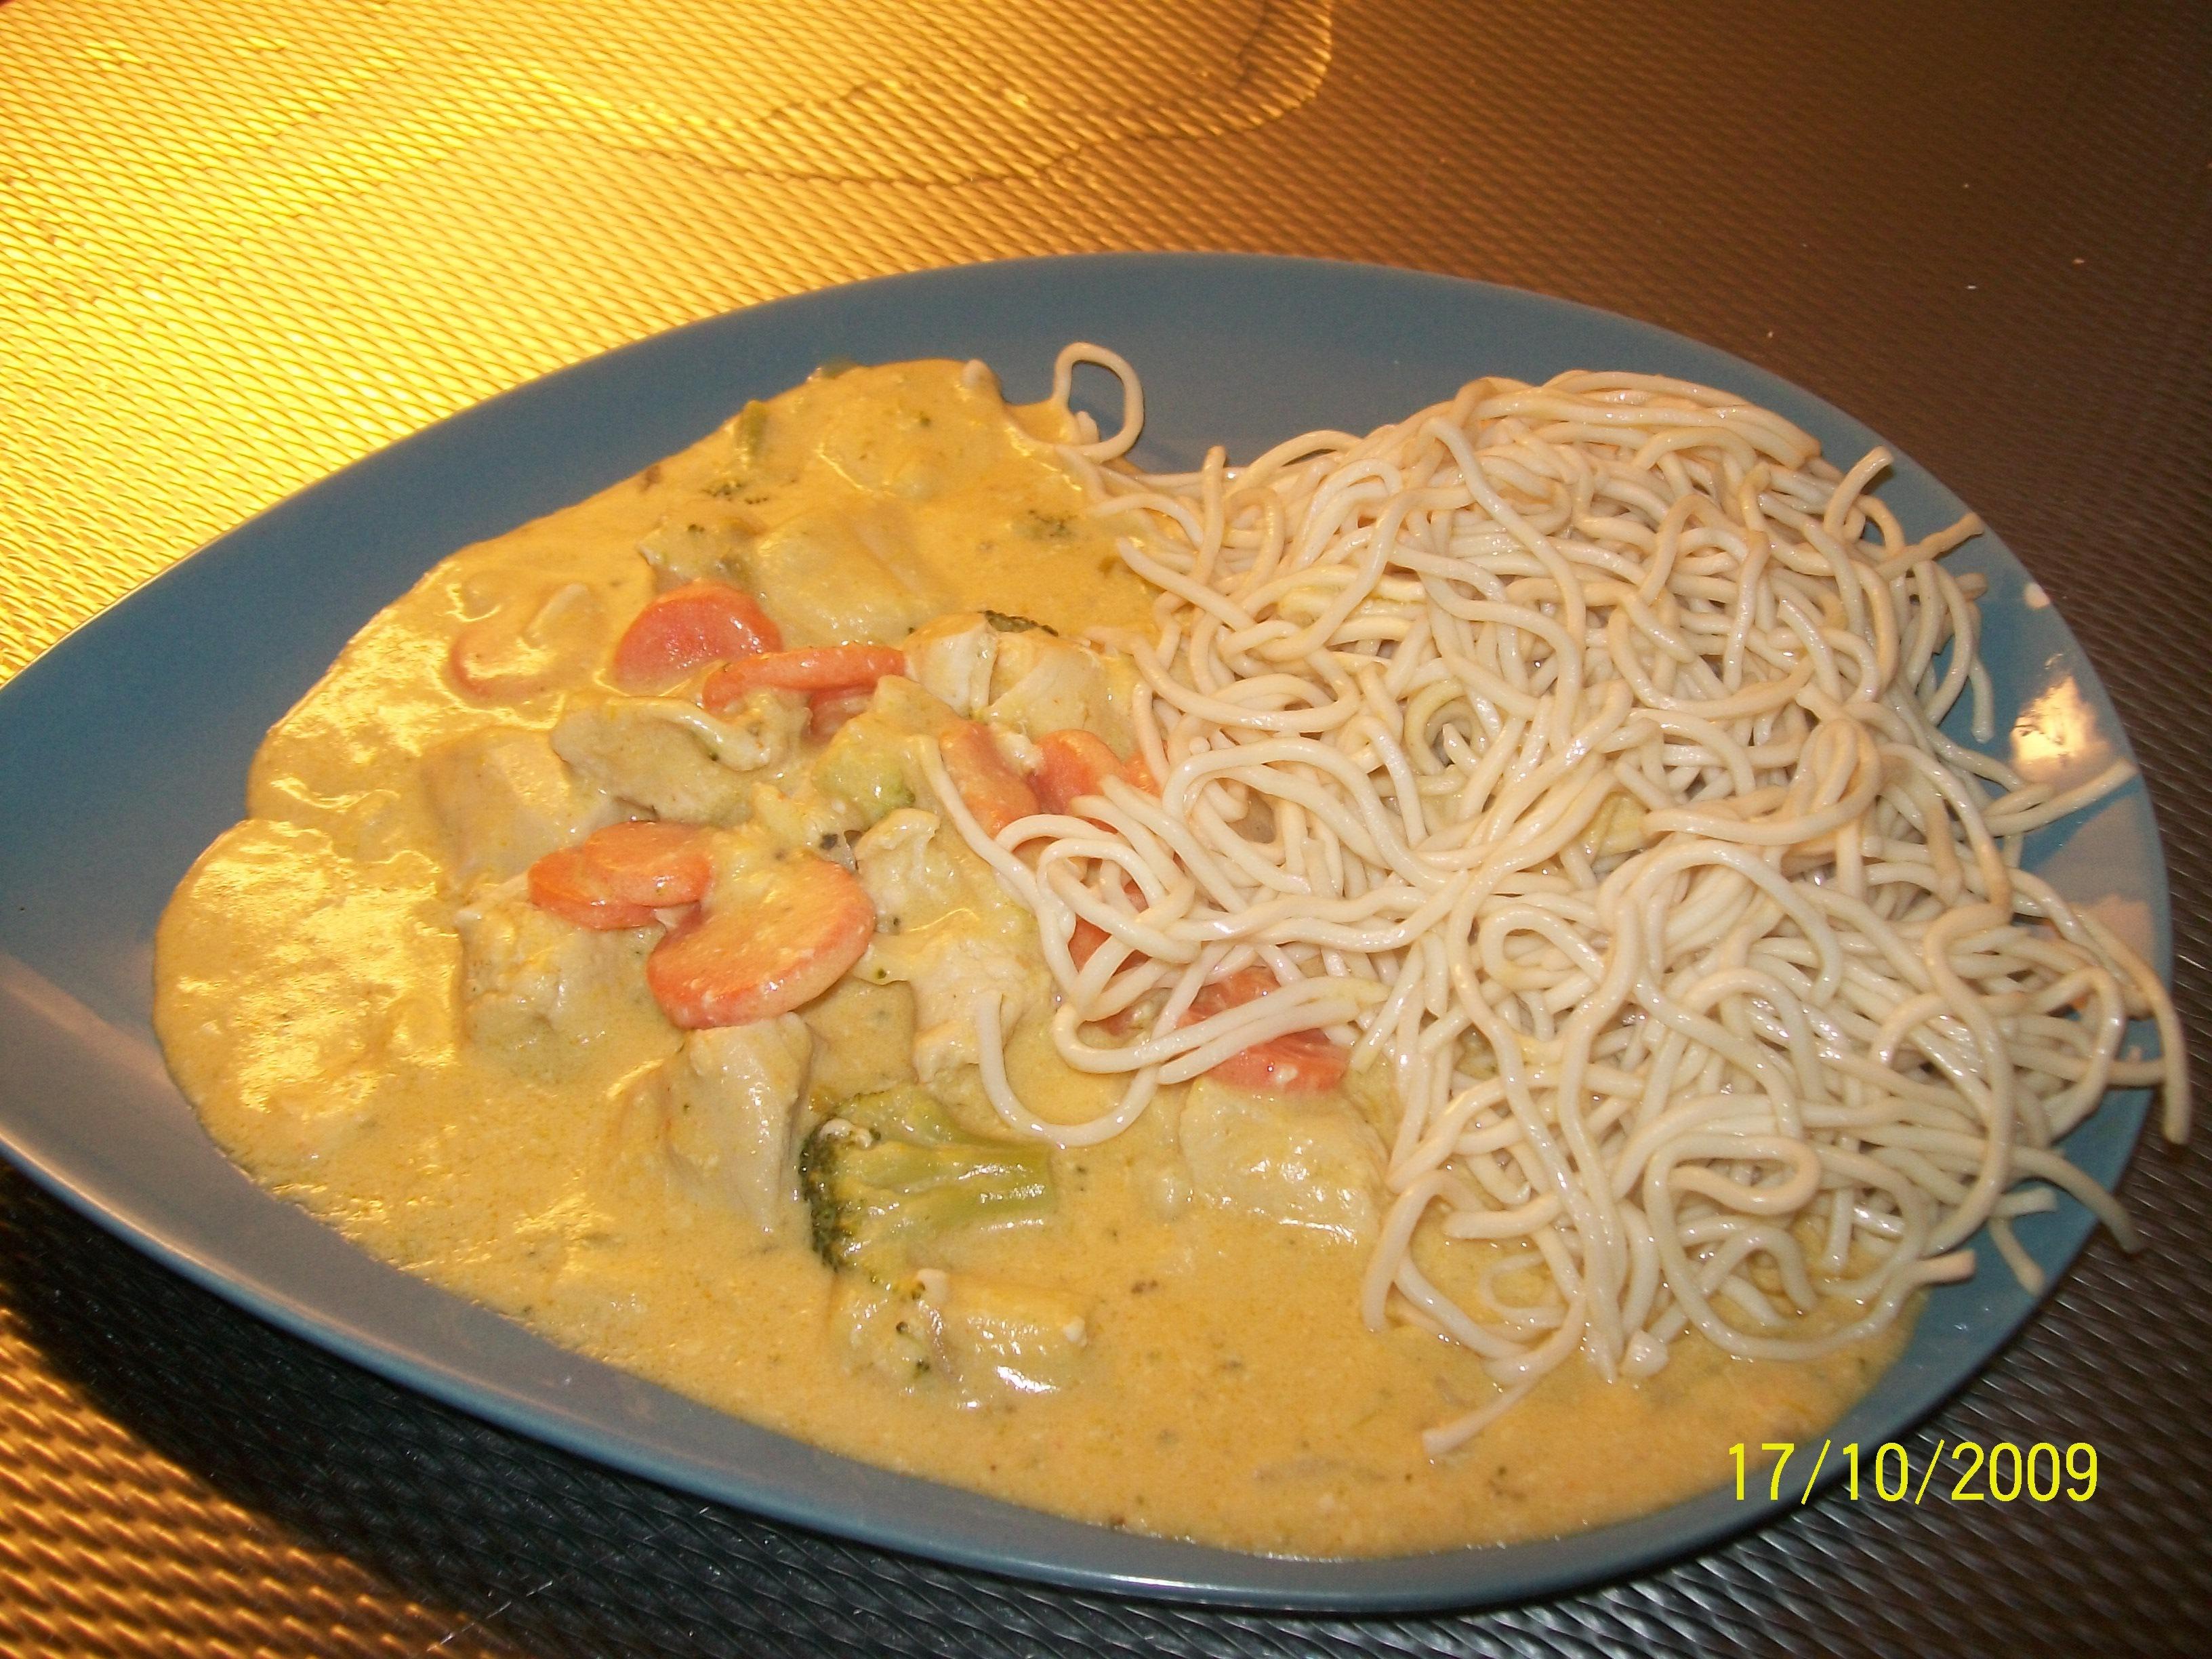 kyckling wokgrönsaker kokosmjölk